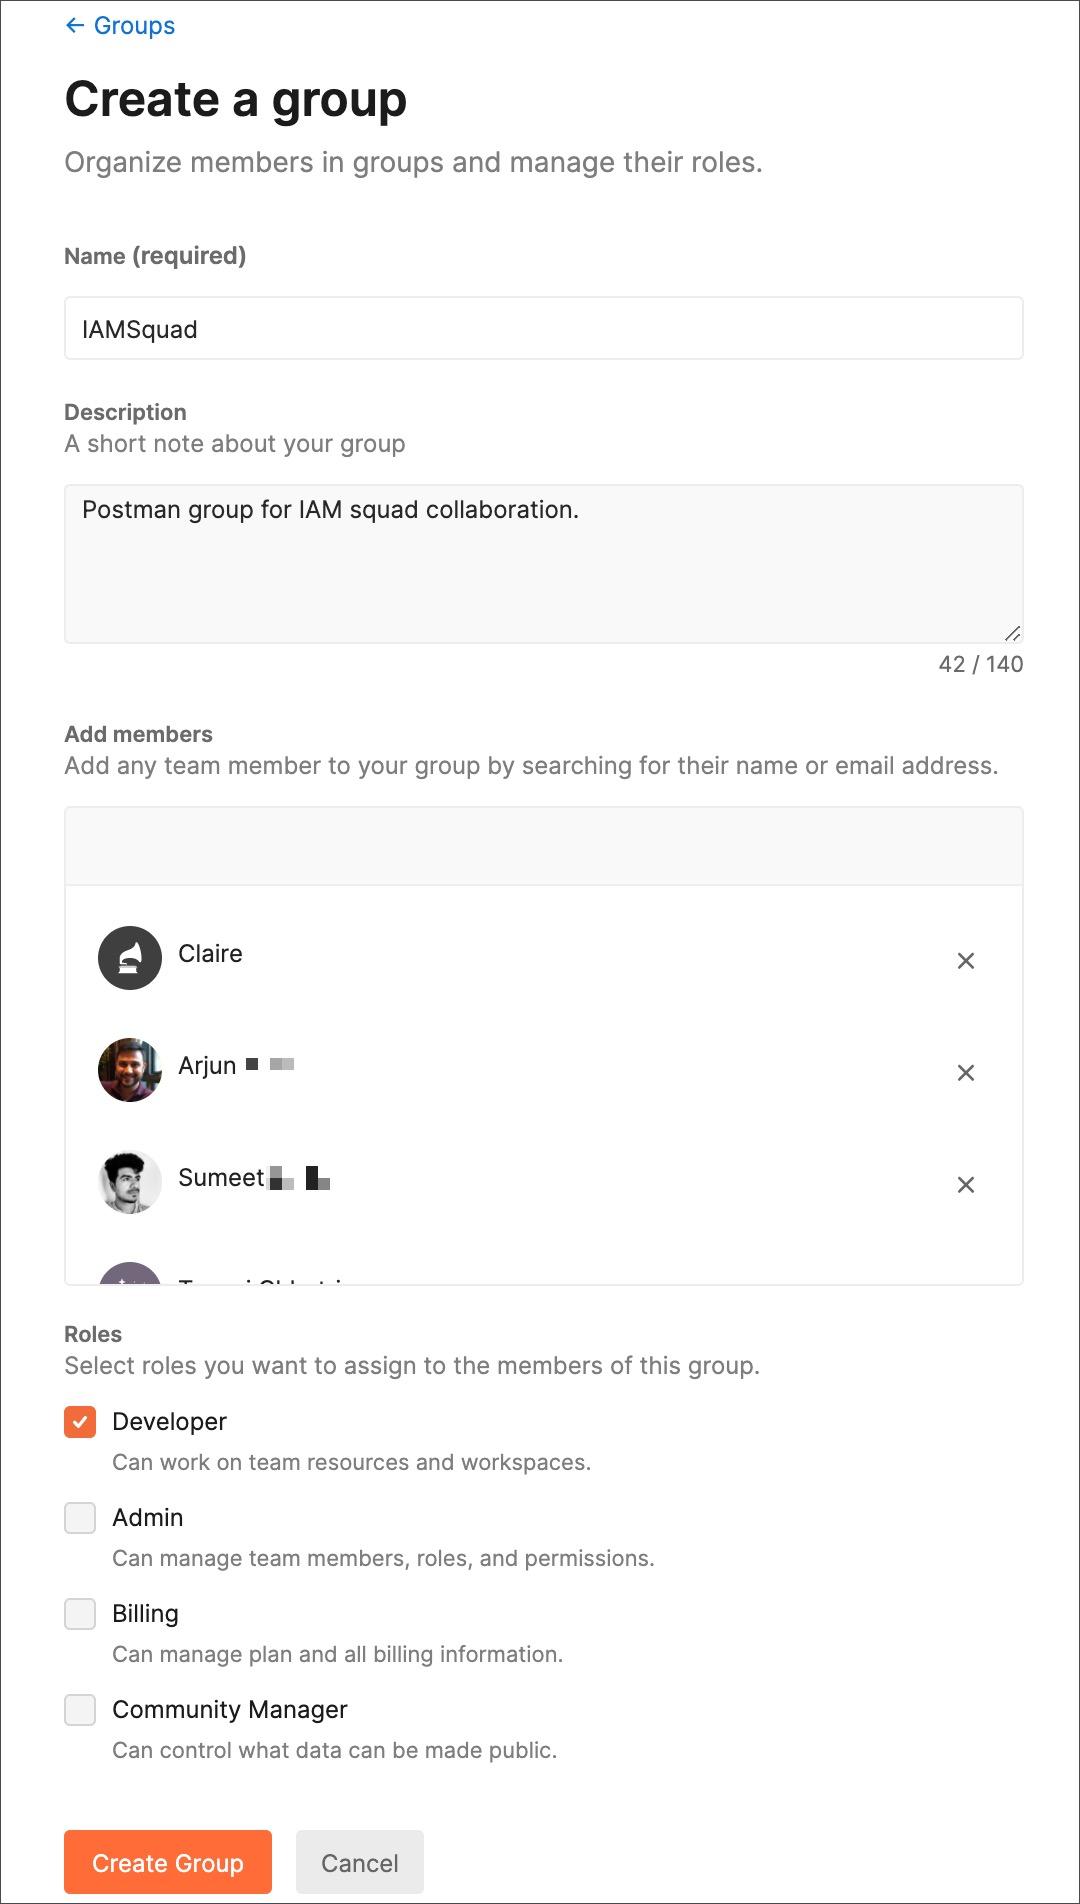 Create group form